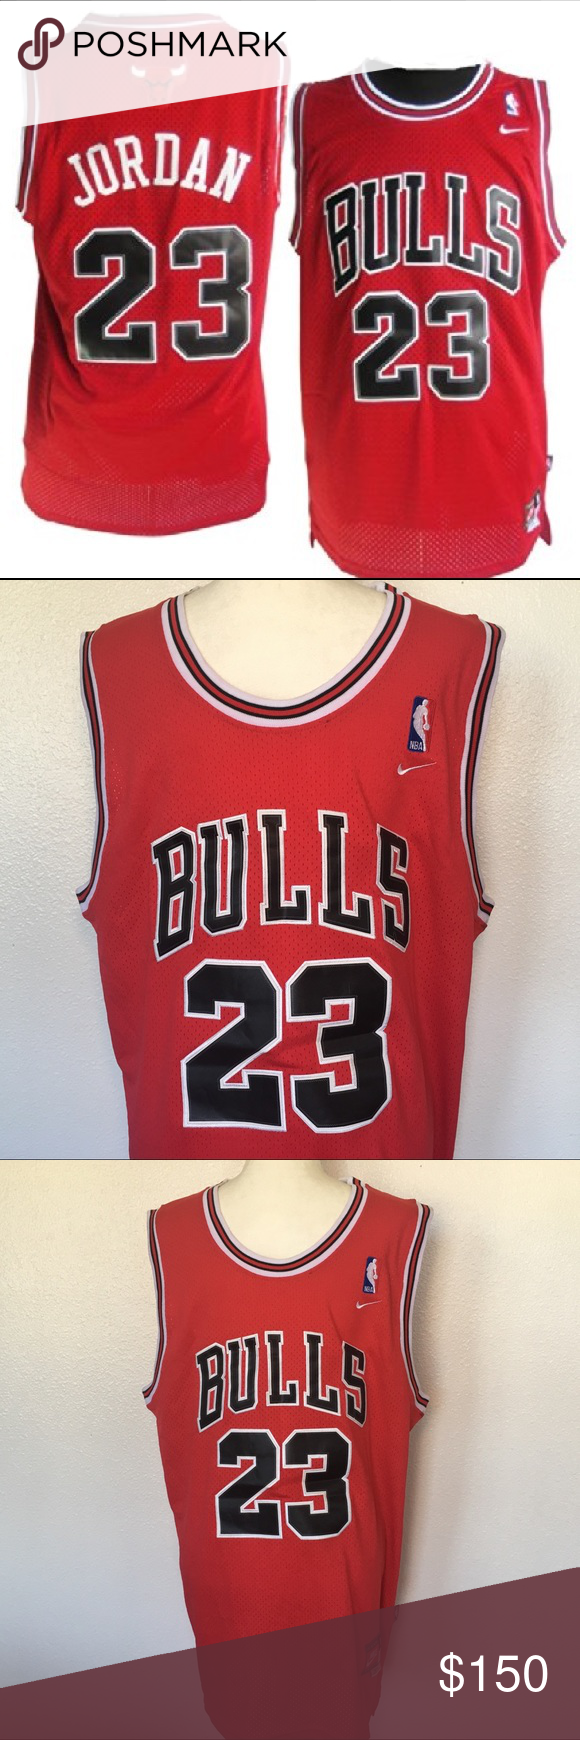 d0958c4b2fb Nike Chicago Bulls Jordan Rewind Swingman Jersey Nike Chicago Bulls Michael  Jordan Rewind Swingman Throwback Jersey